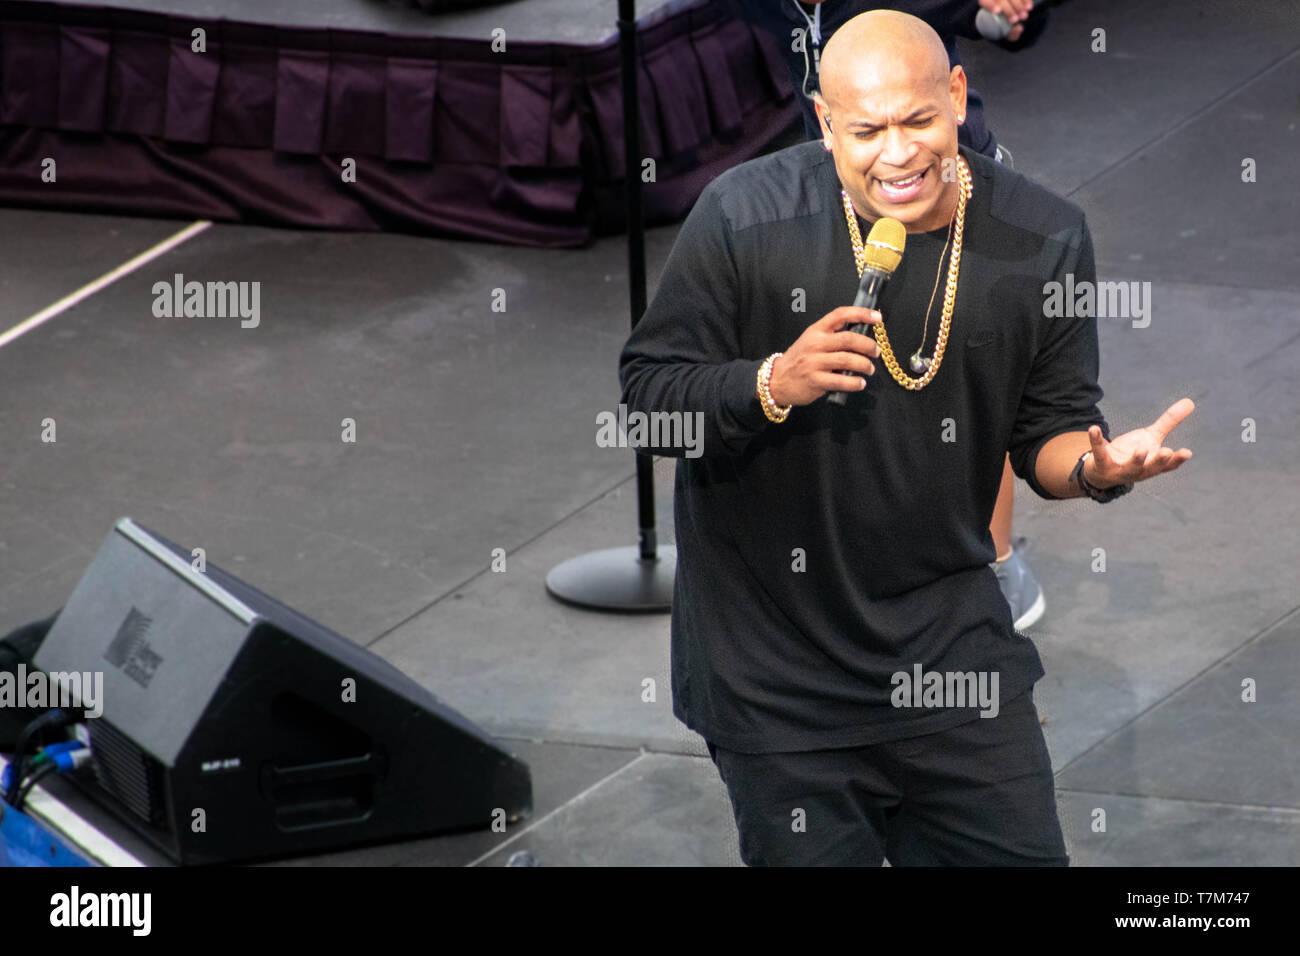 Orlando, Florida. March 17, 2019. Alexander Delgado by Gente de Zona singing urban music at Seaworld  in International Drive Area (15) Stock Photo